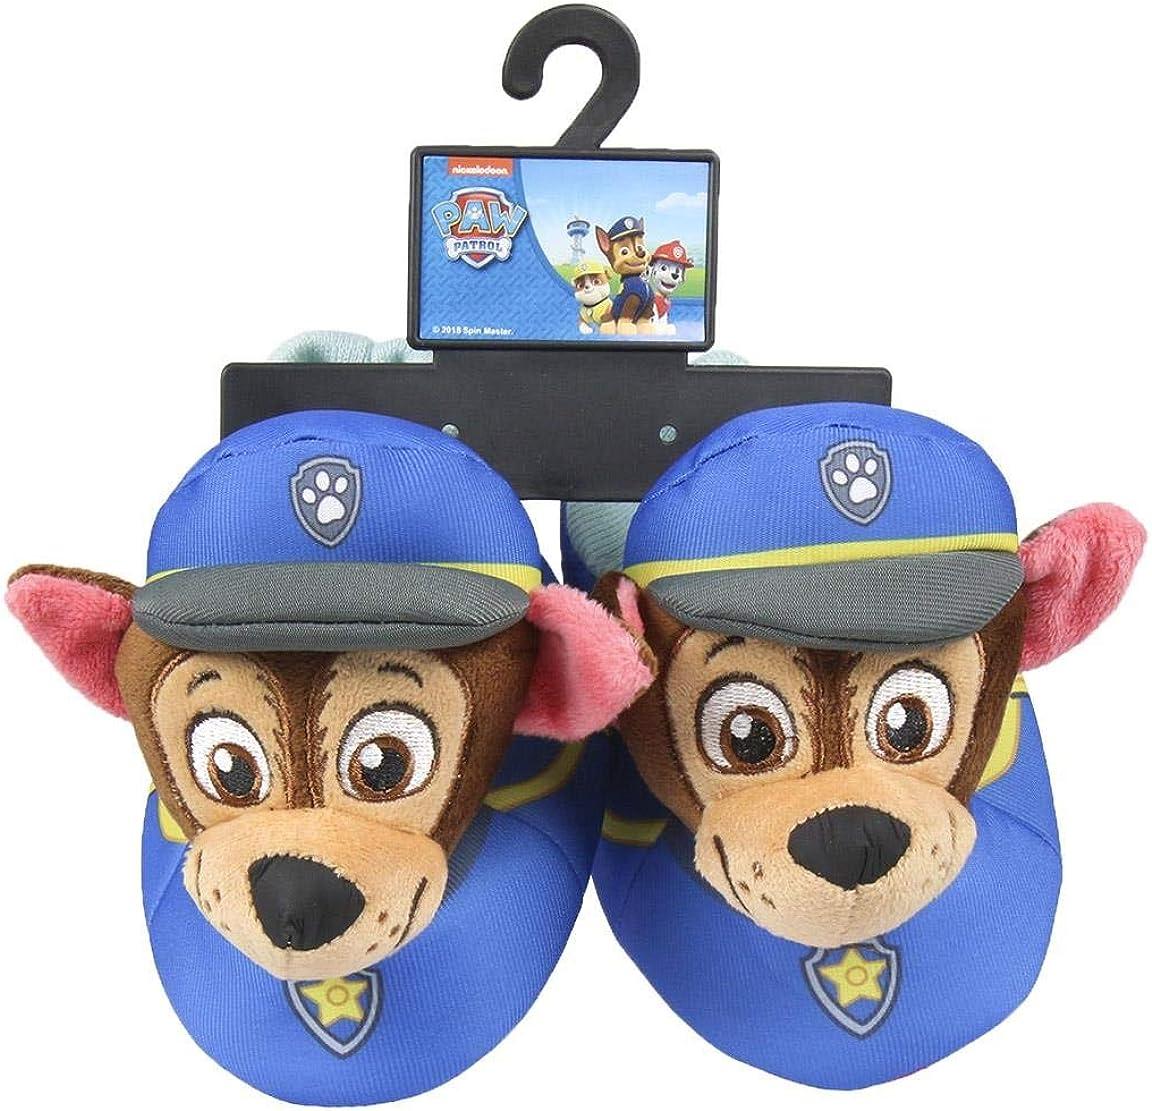 Chaussons gar/çon Cerd/á Zapatillas de CASA 3D Paw Patrol Chase